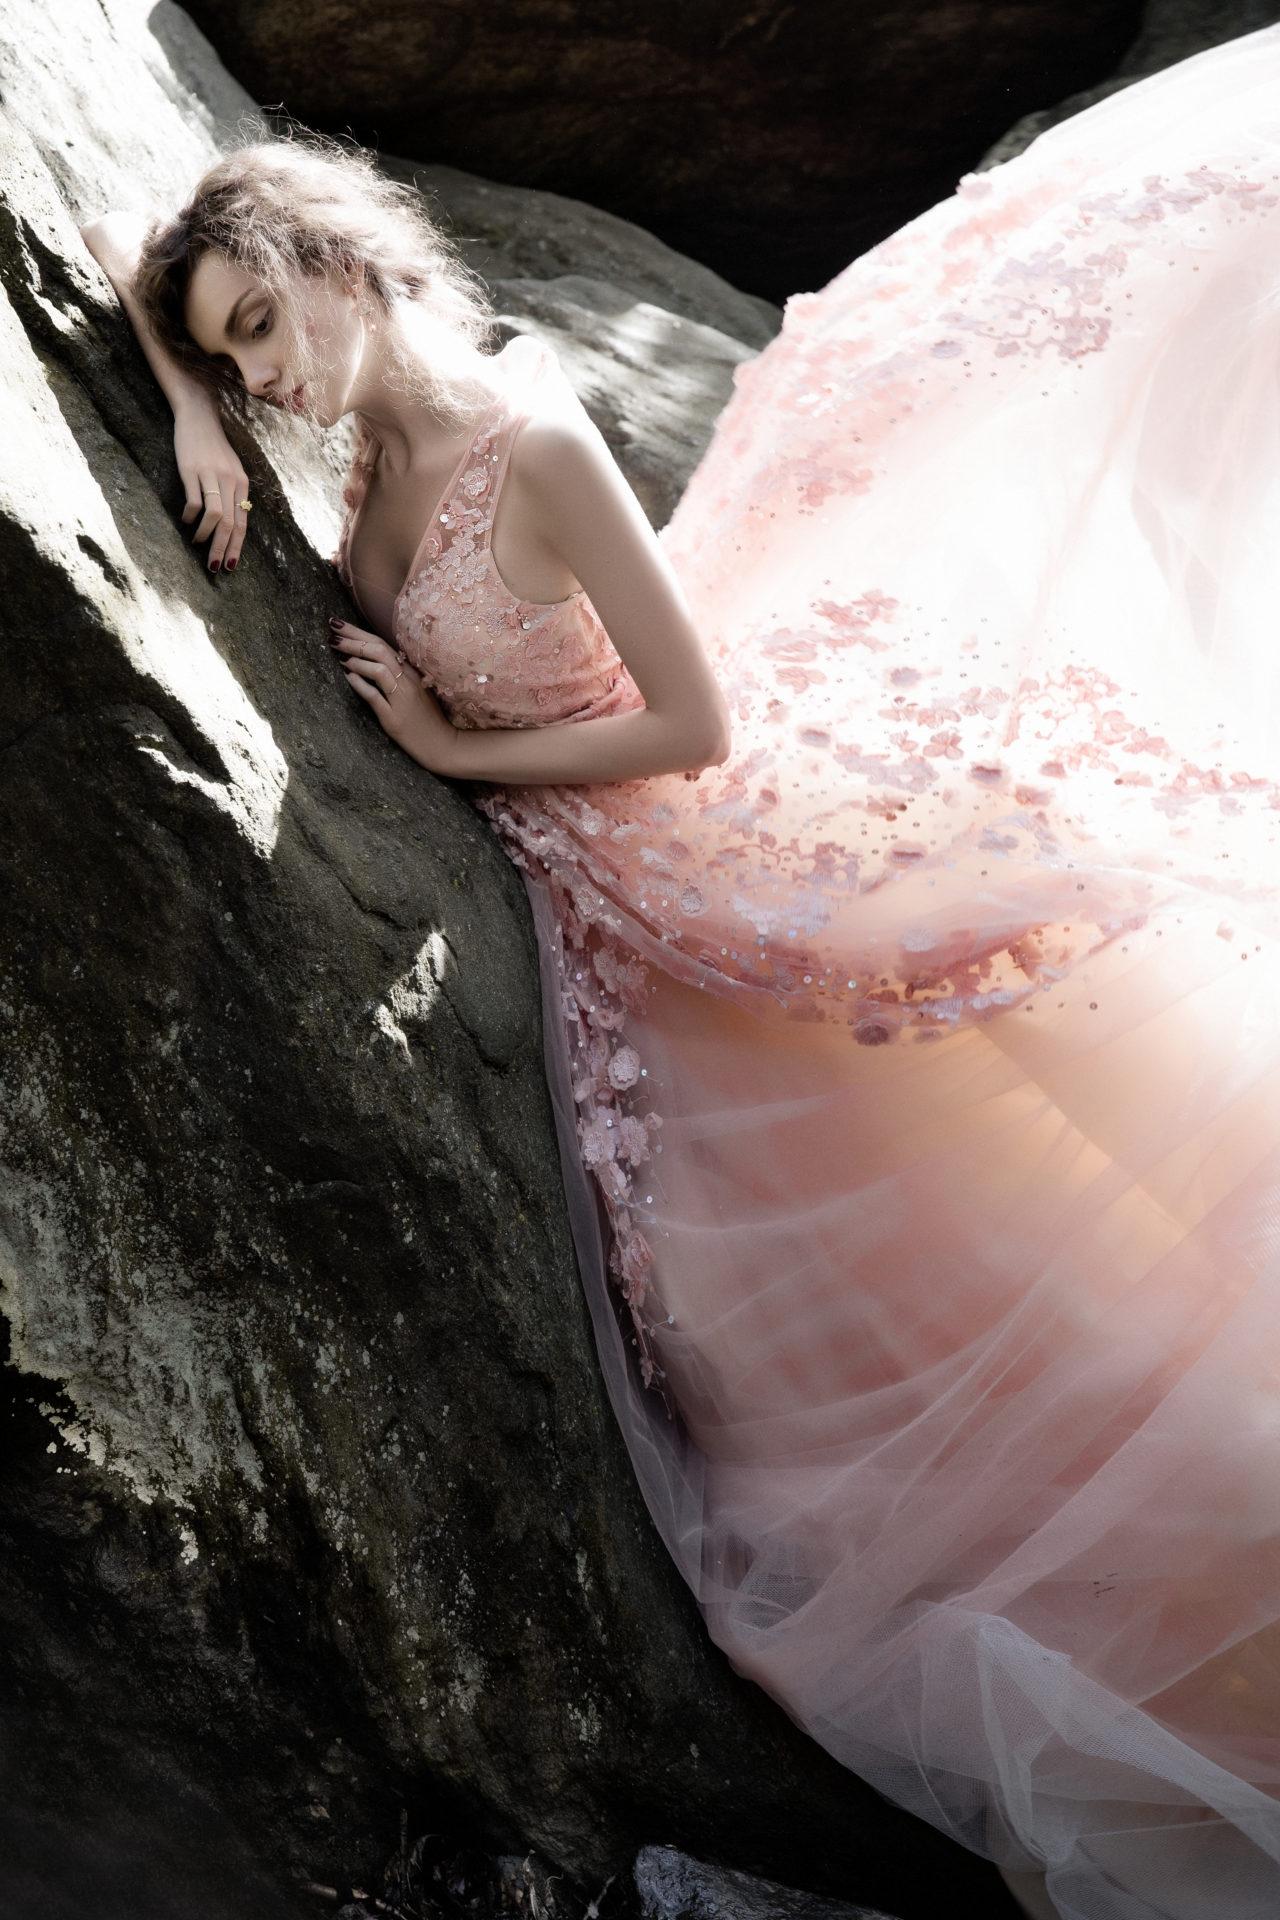 Dress - Basix. Rings and earrings - Solomeina.